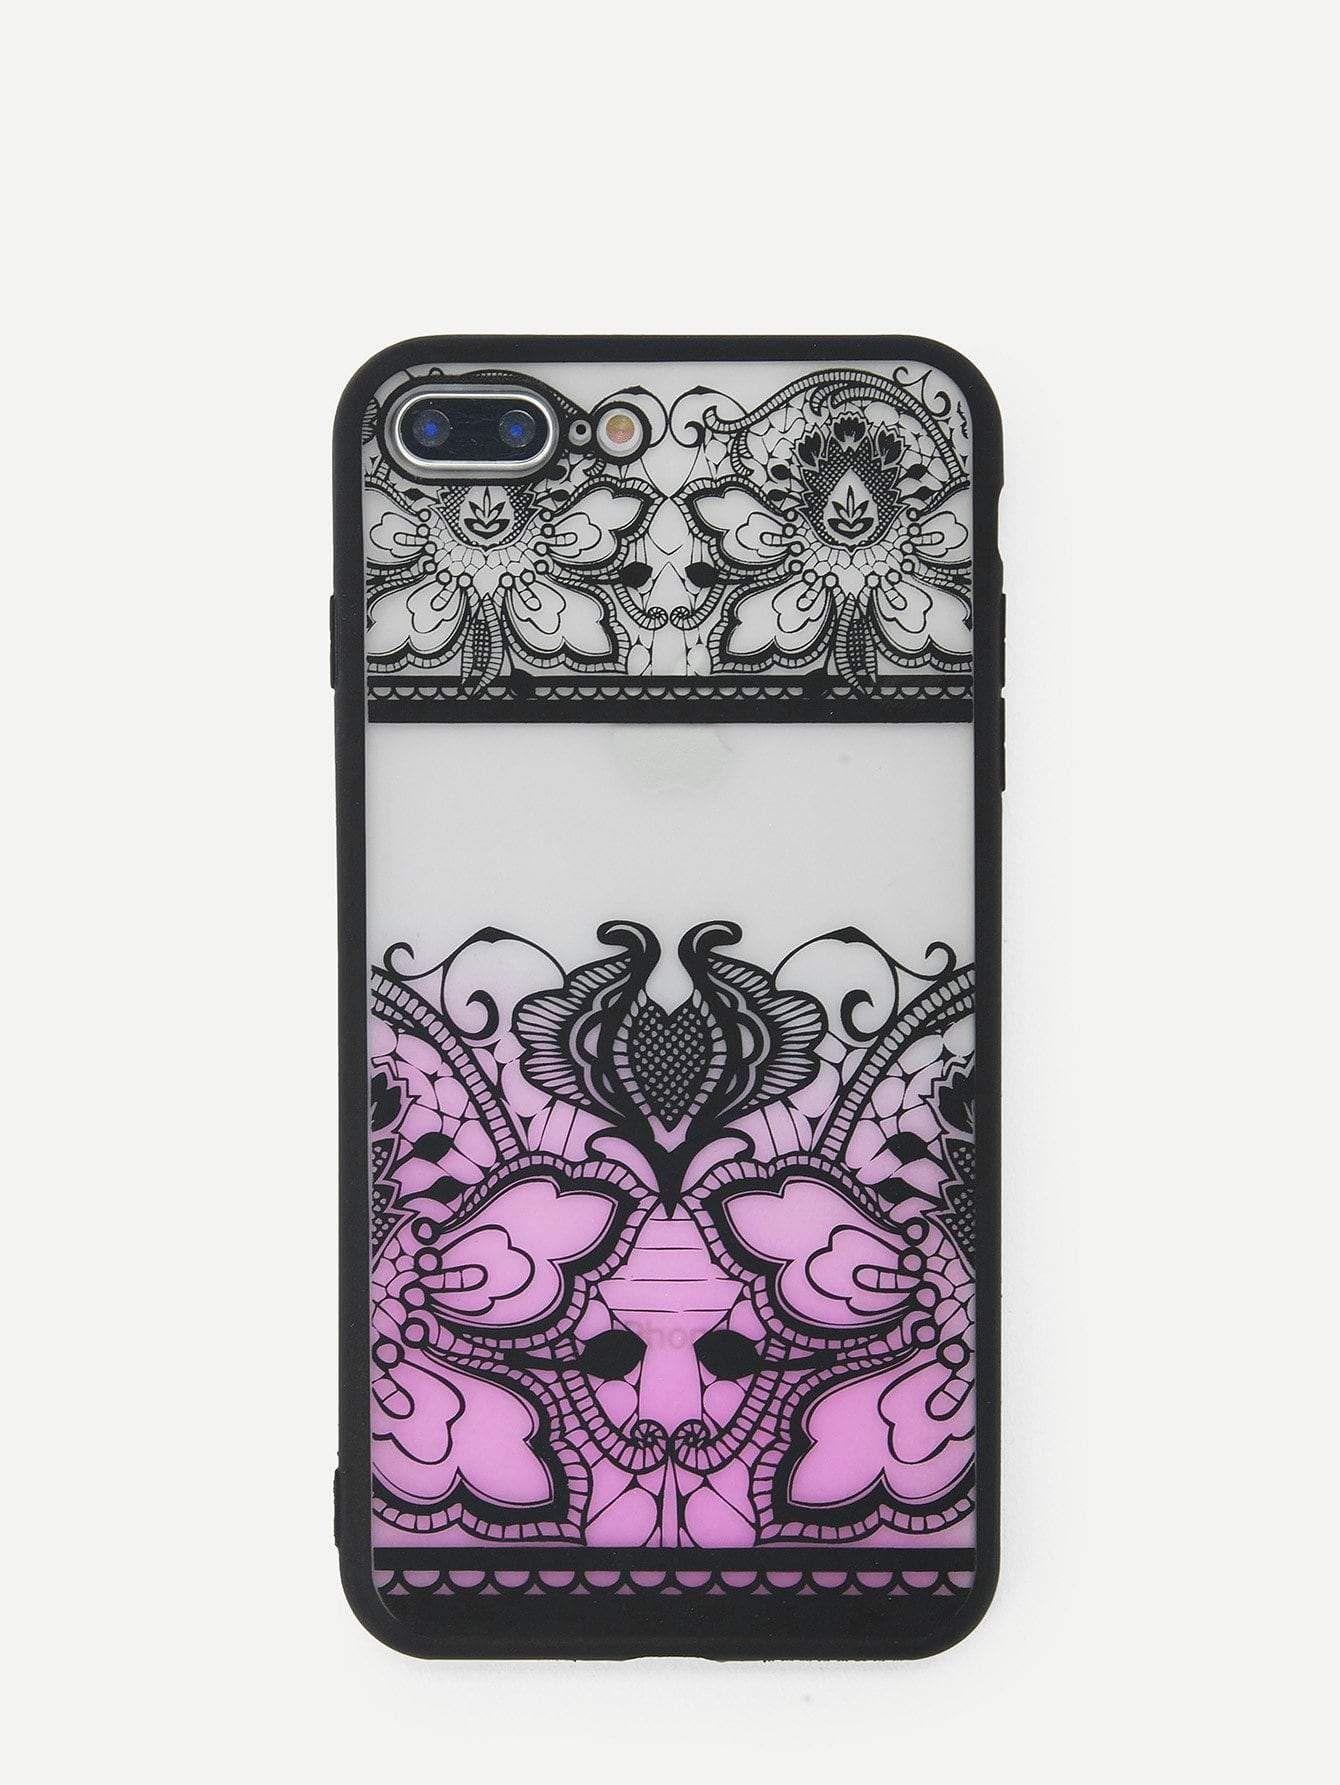 Butterfly pattern iphone case pattern iphone case